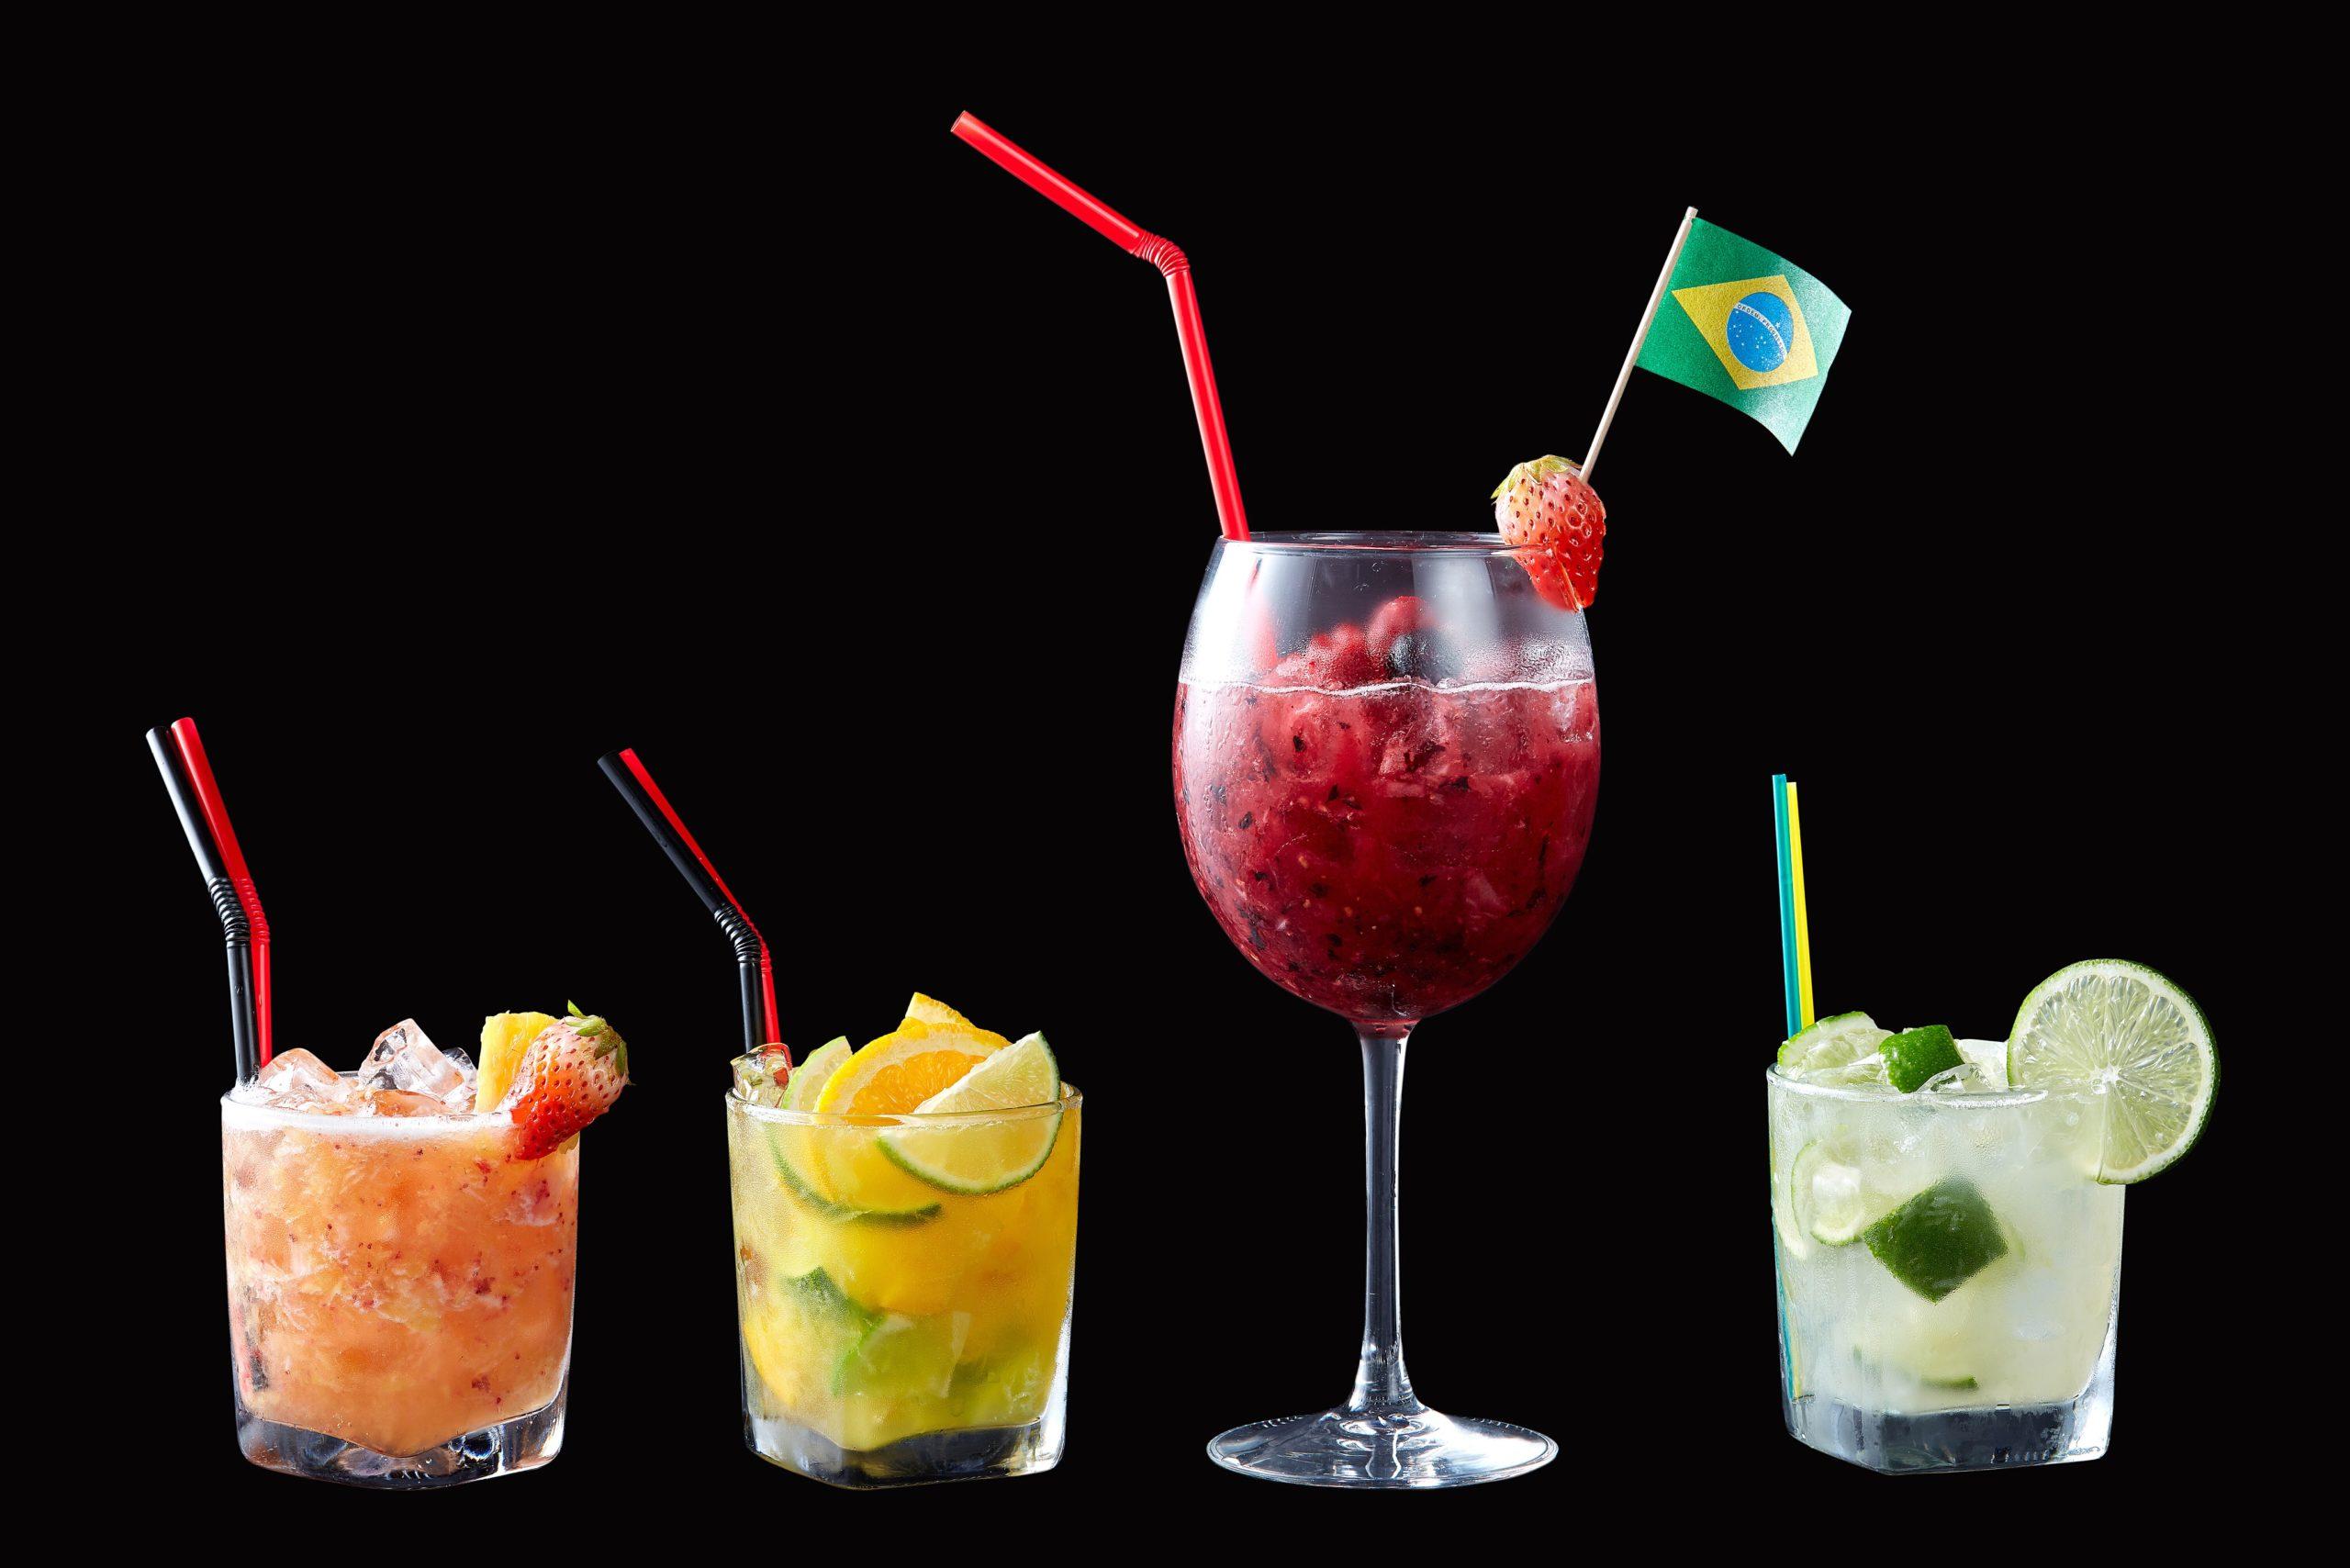 Original Brazilian Drinks for Perfect Memories